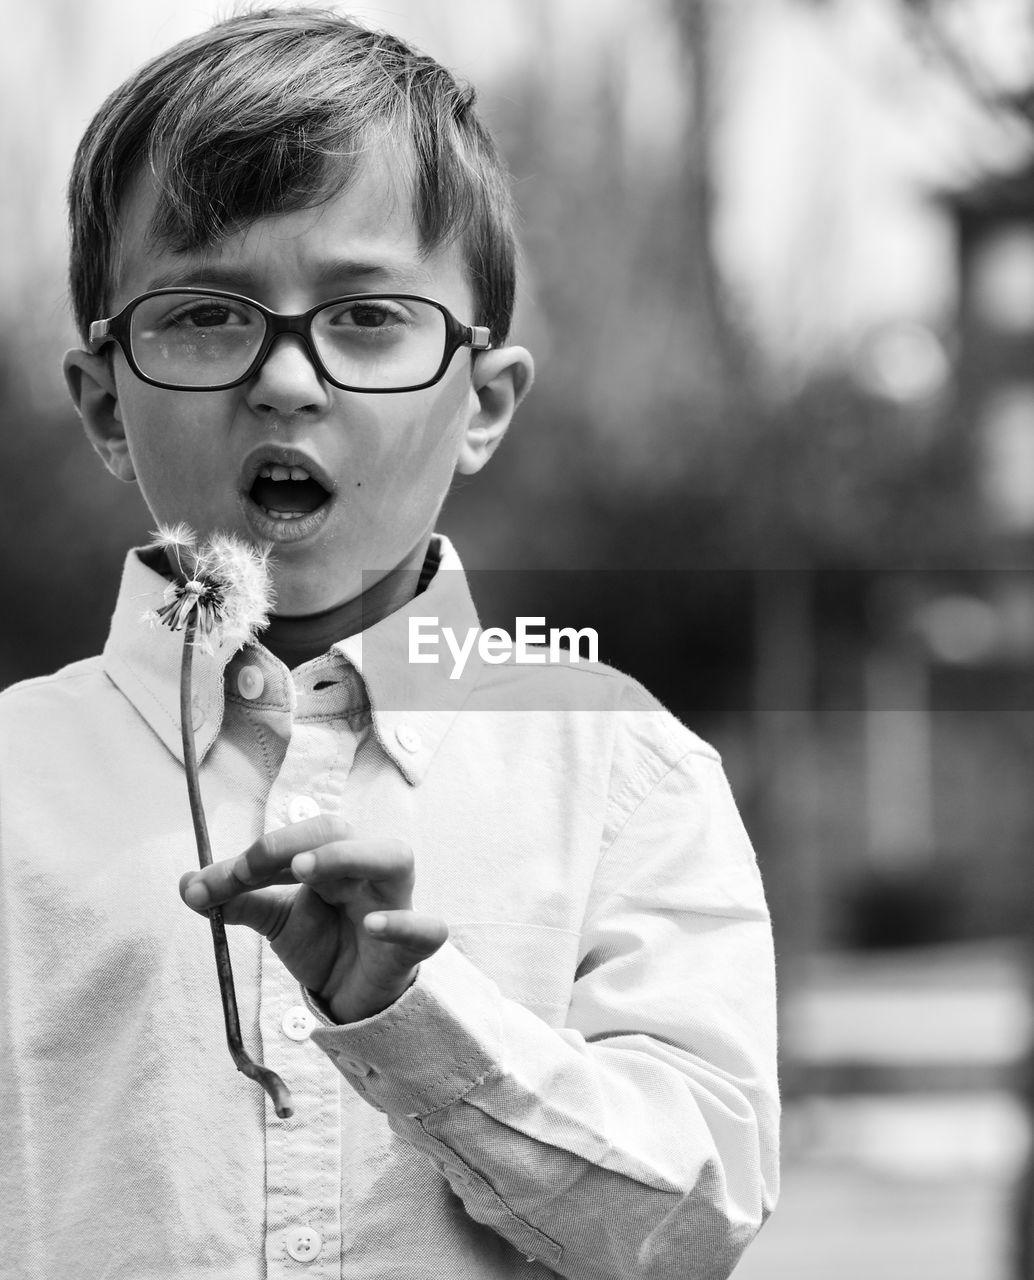 FULL LENGTH PORTRAIT OF BOY HOLDING ICE CREAM